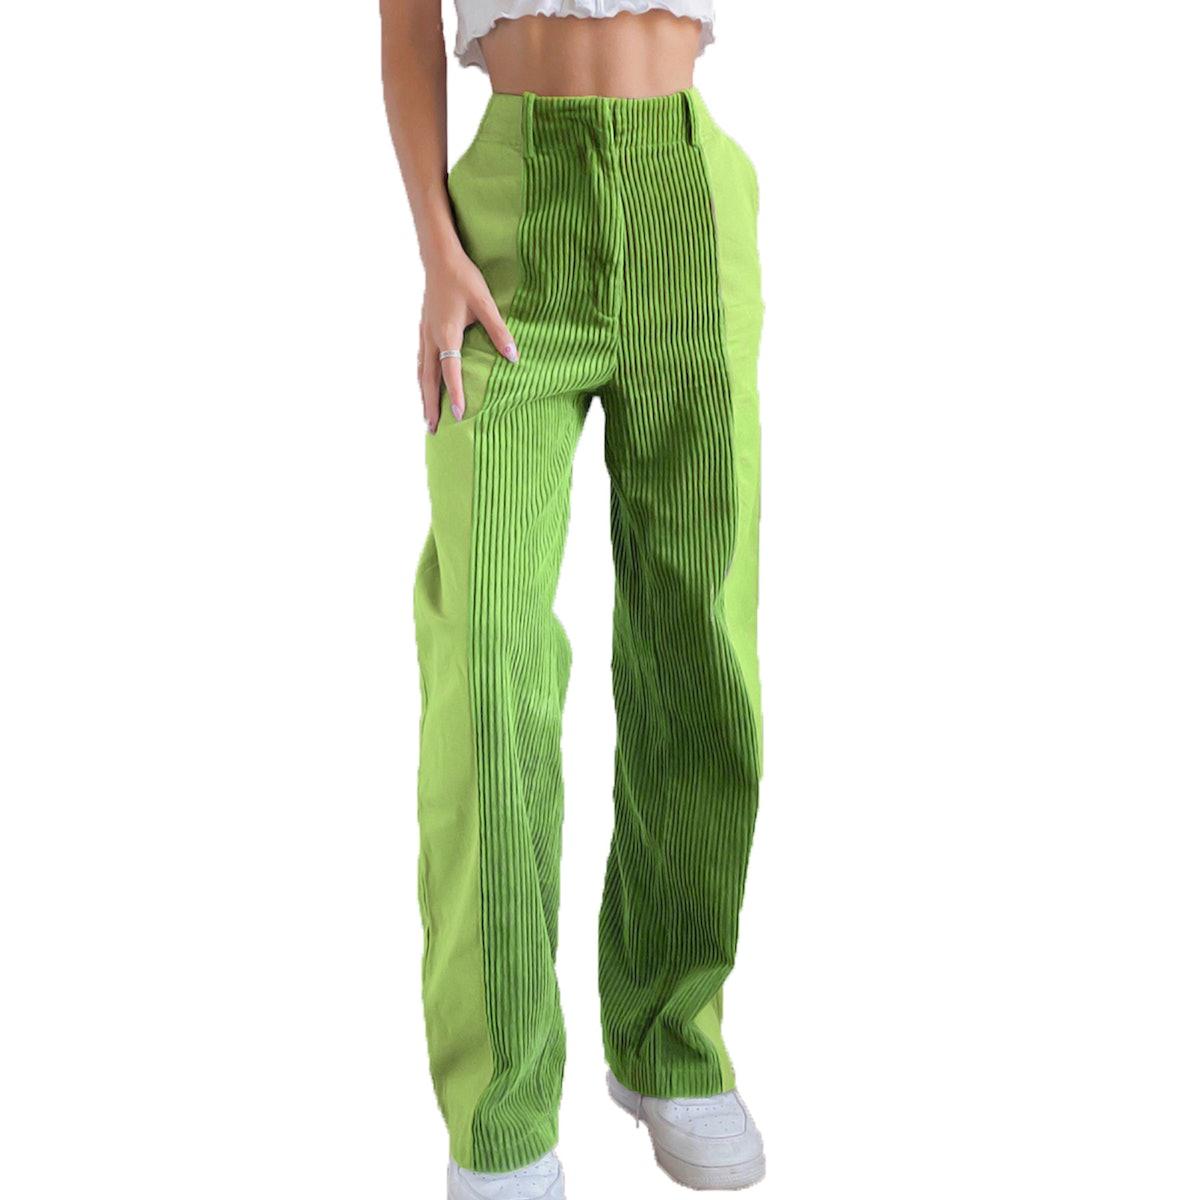 Listenwind Women's Corduroy Patchwork Pants High-Waist Gradient Trousers Straight Wide Leg Zipper Po...